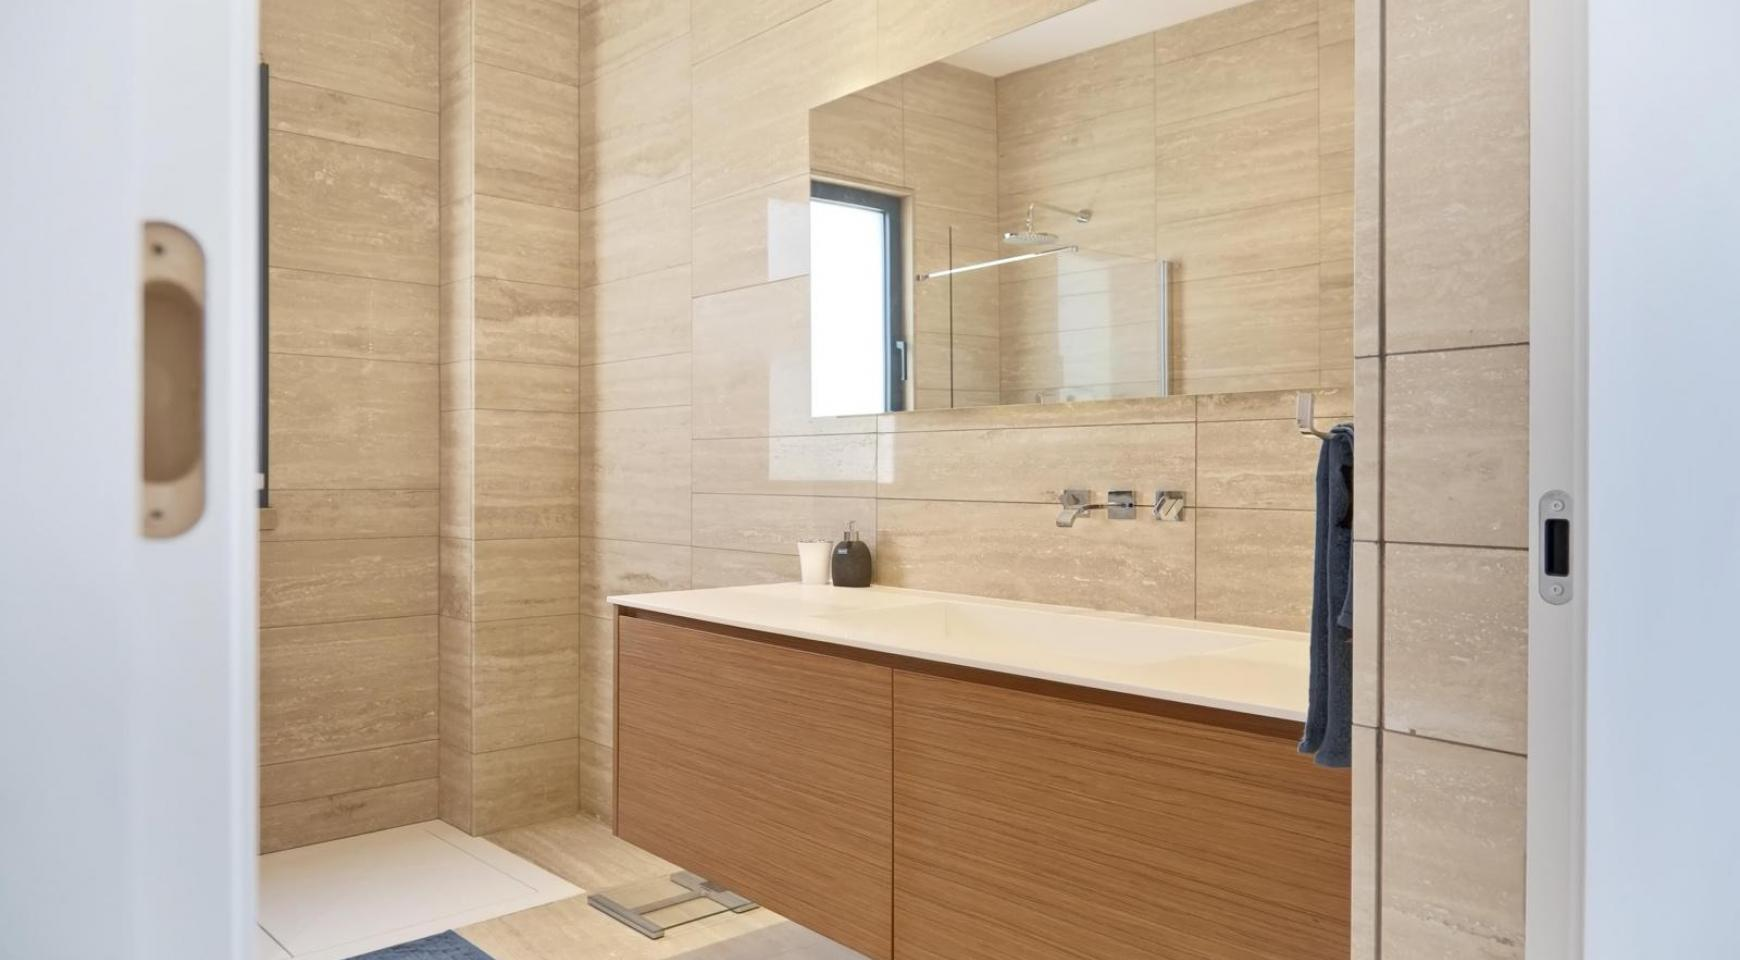 New Luxurious 4 Bedroom Villa in the Tourist Area - 44